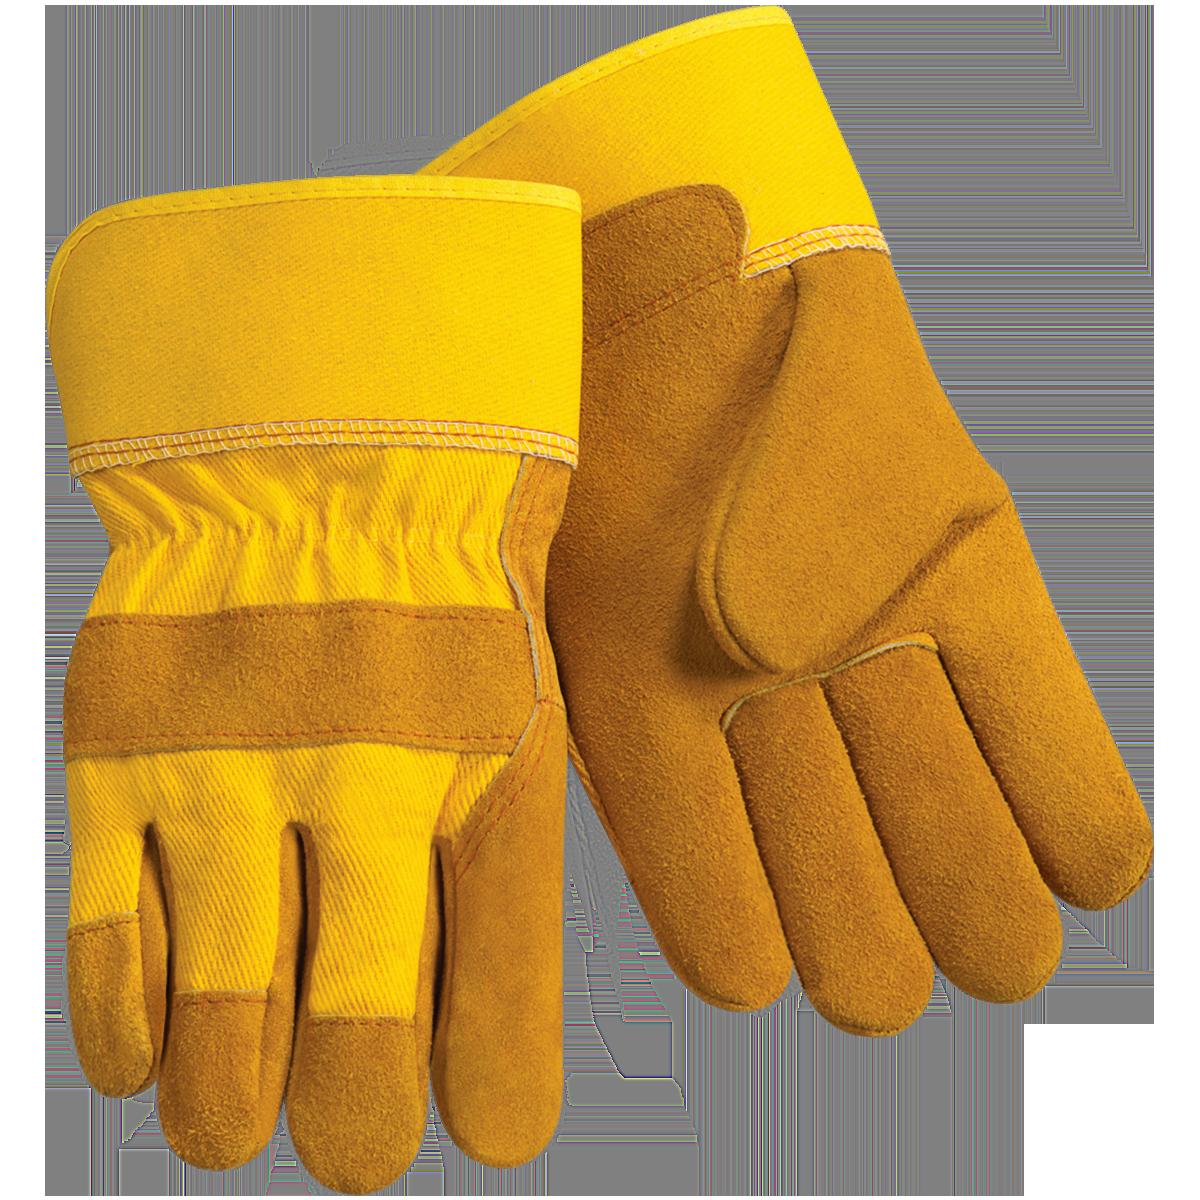 Gloves clipart transparent background. Steiner industries leather palm